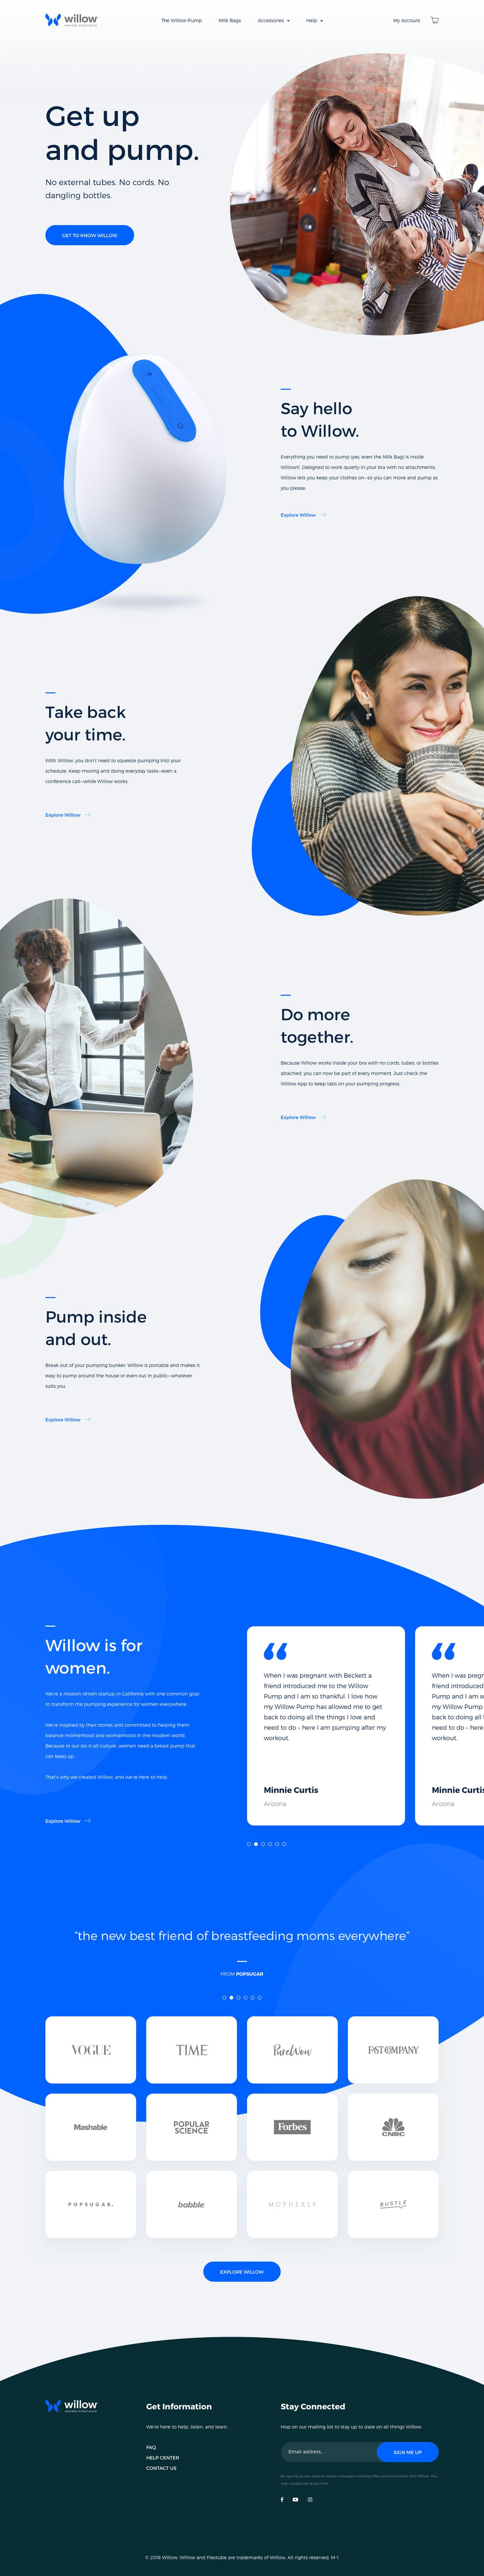 Breast Landing Page Design